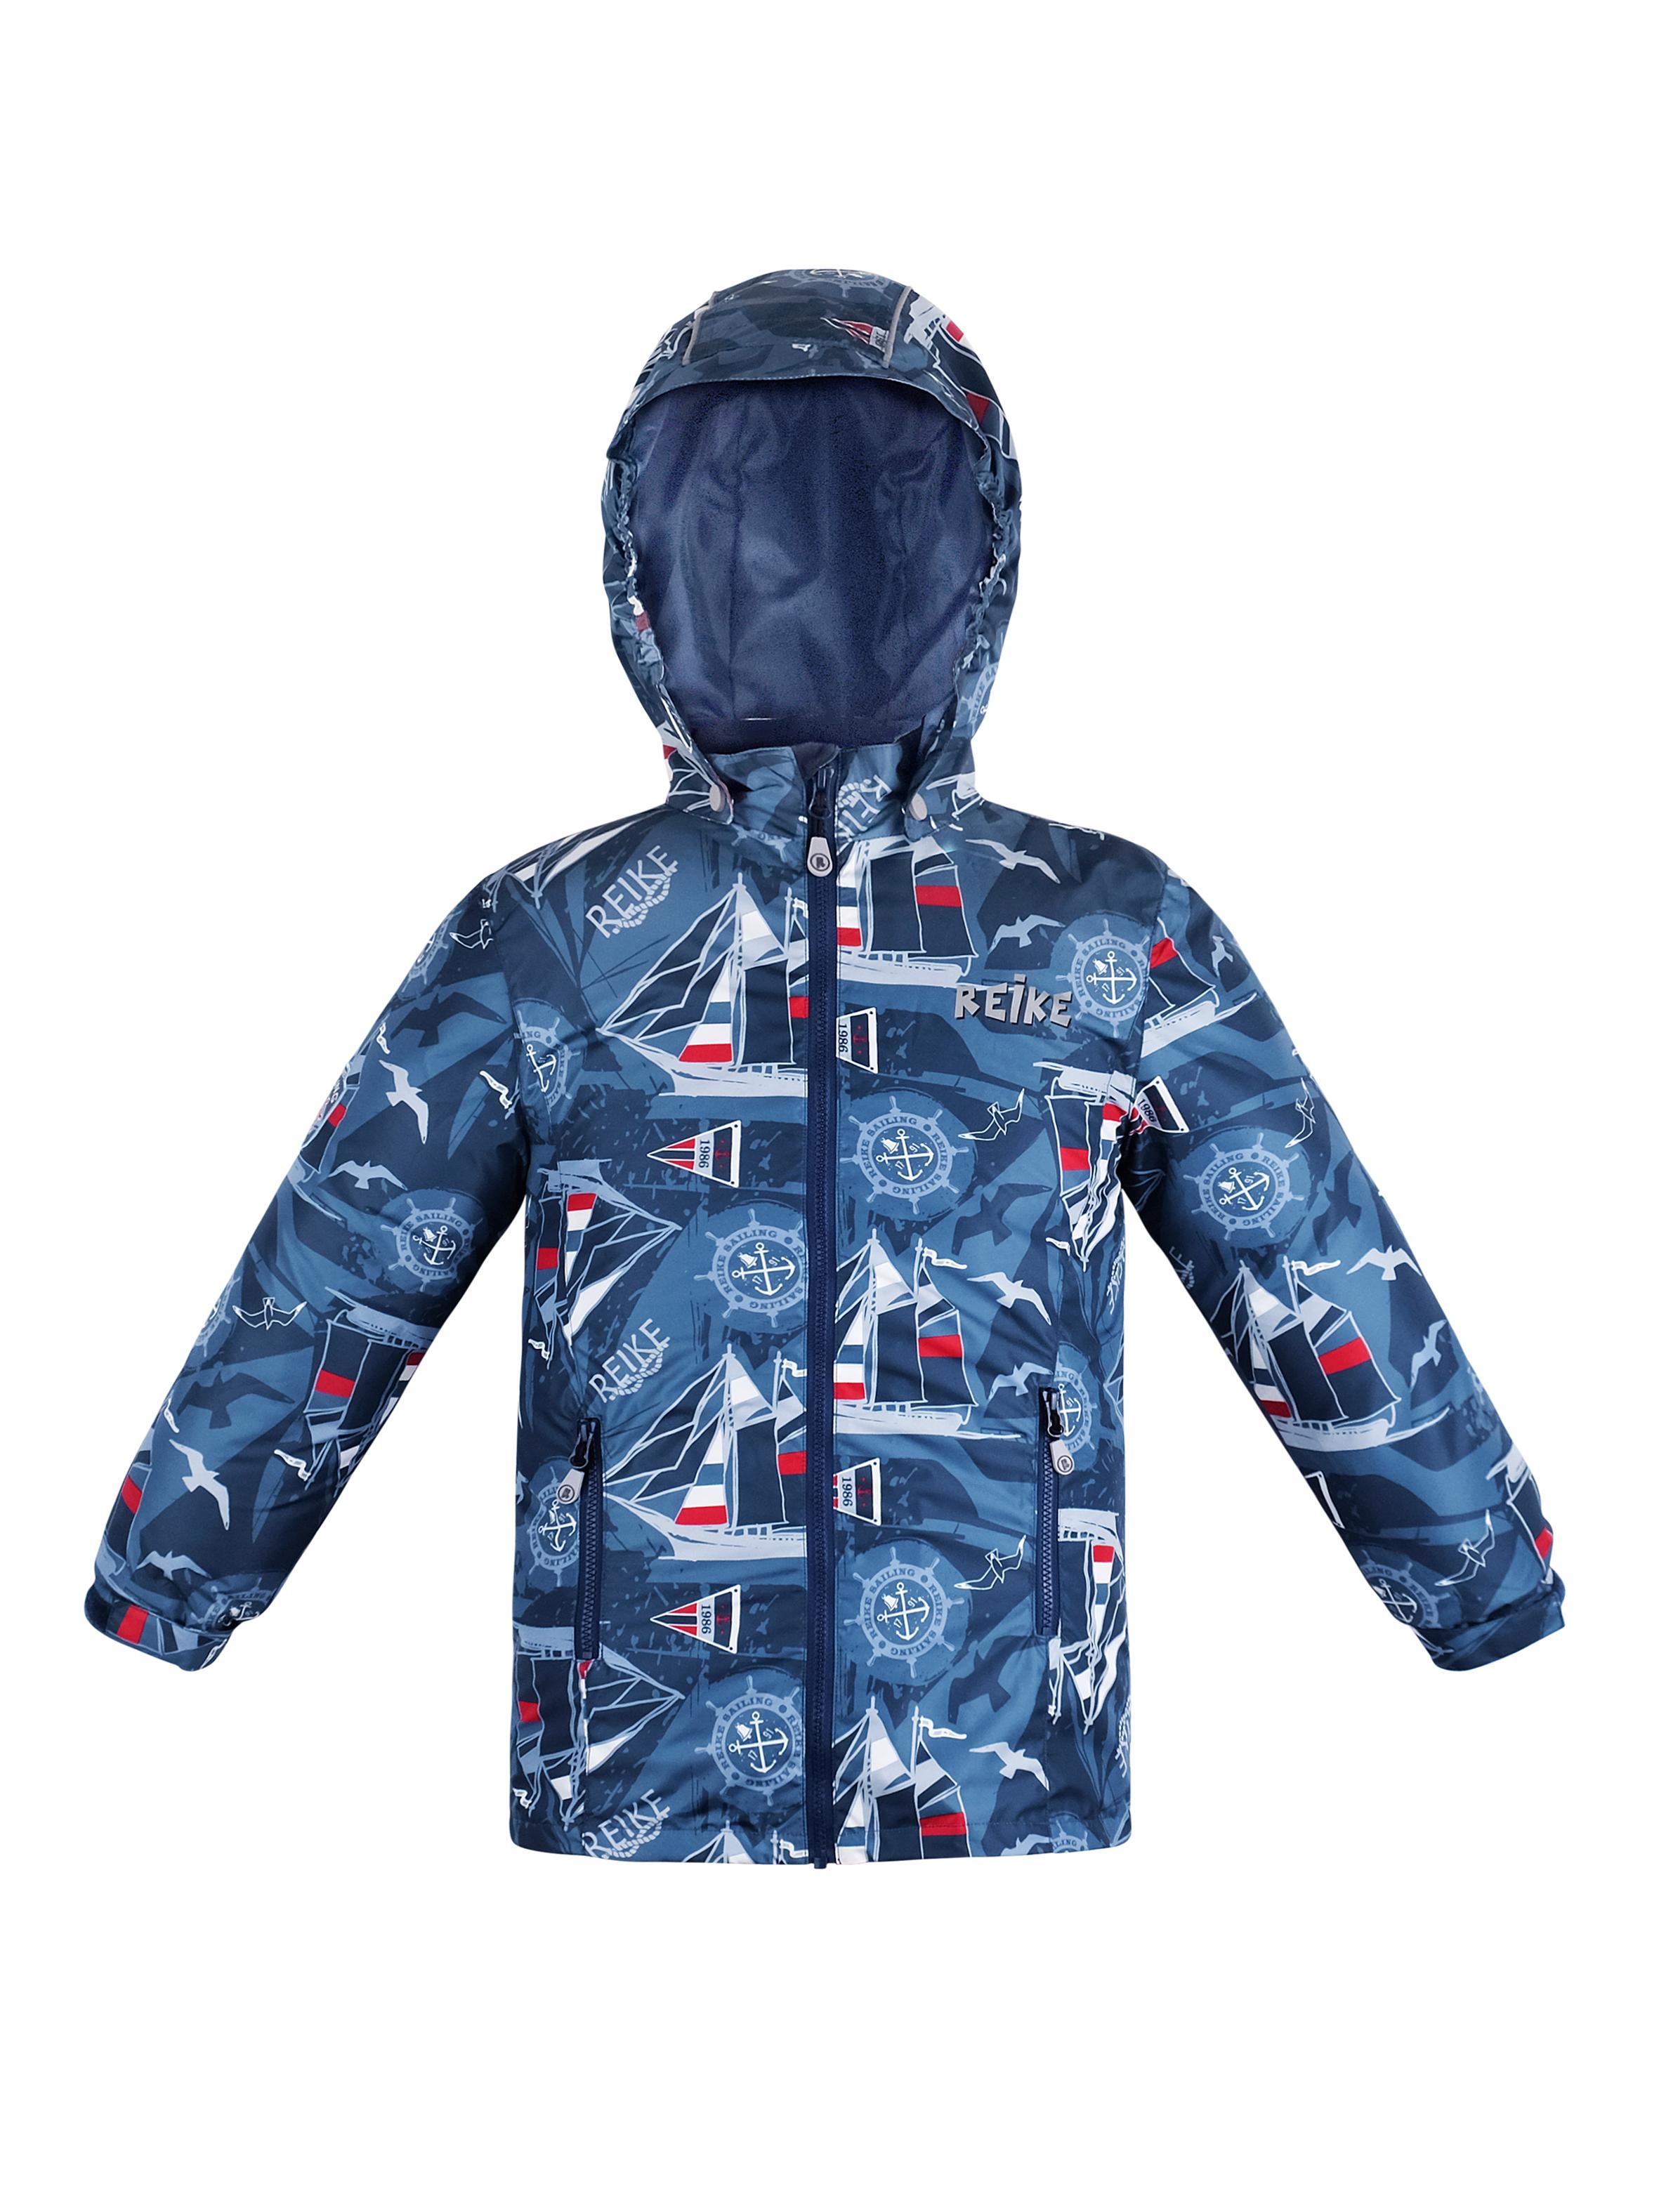 Куртка для мальчика Reike Sailing blue р.152